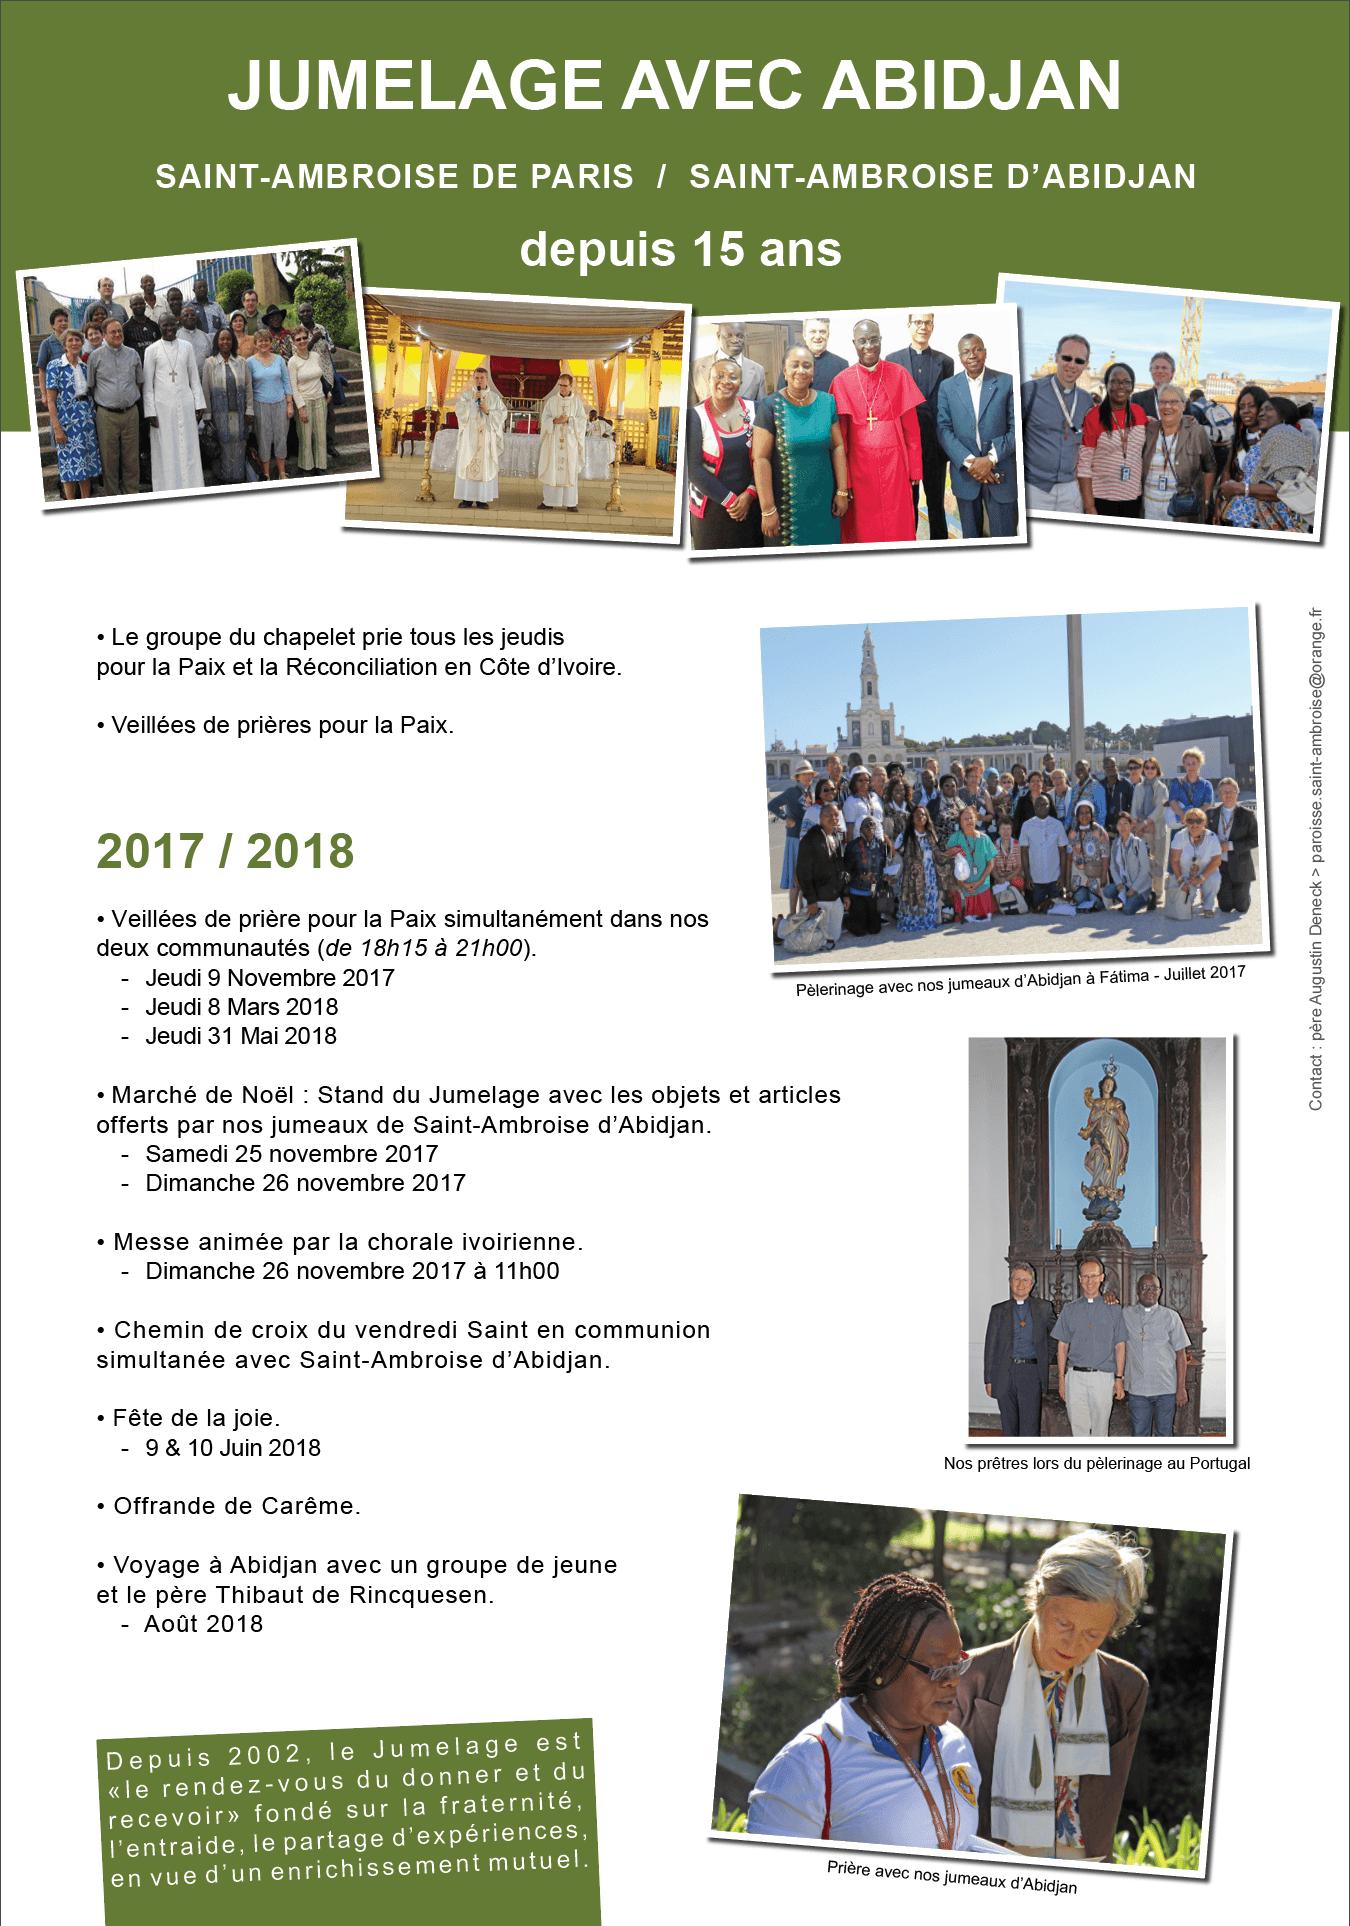 Panneau jumelage Abidjan 2017 2018